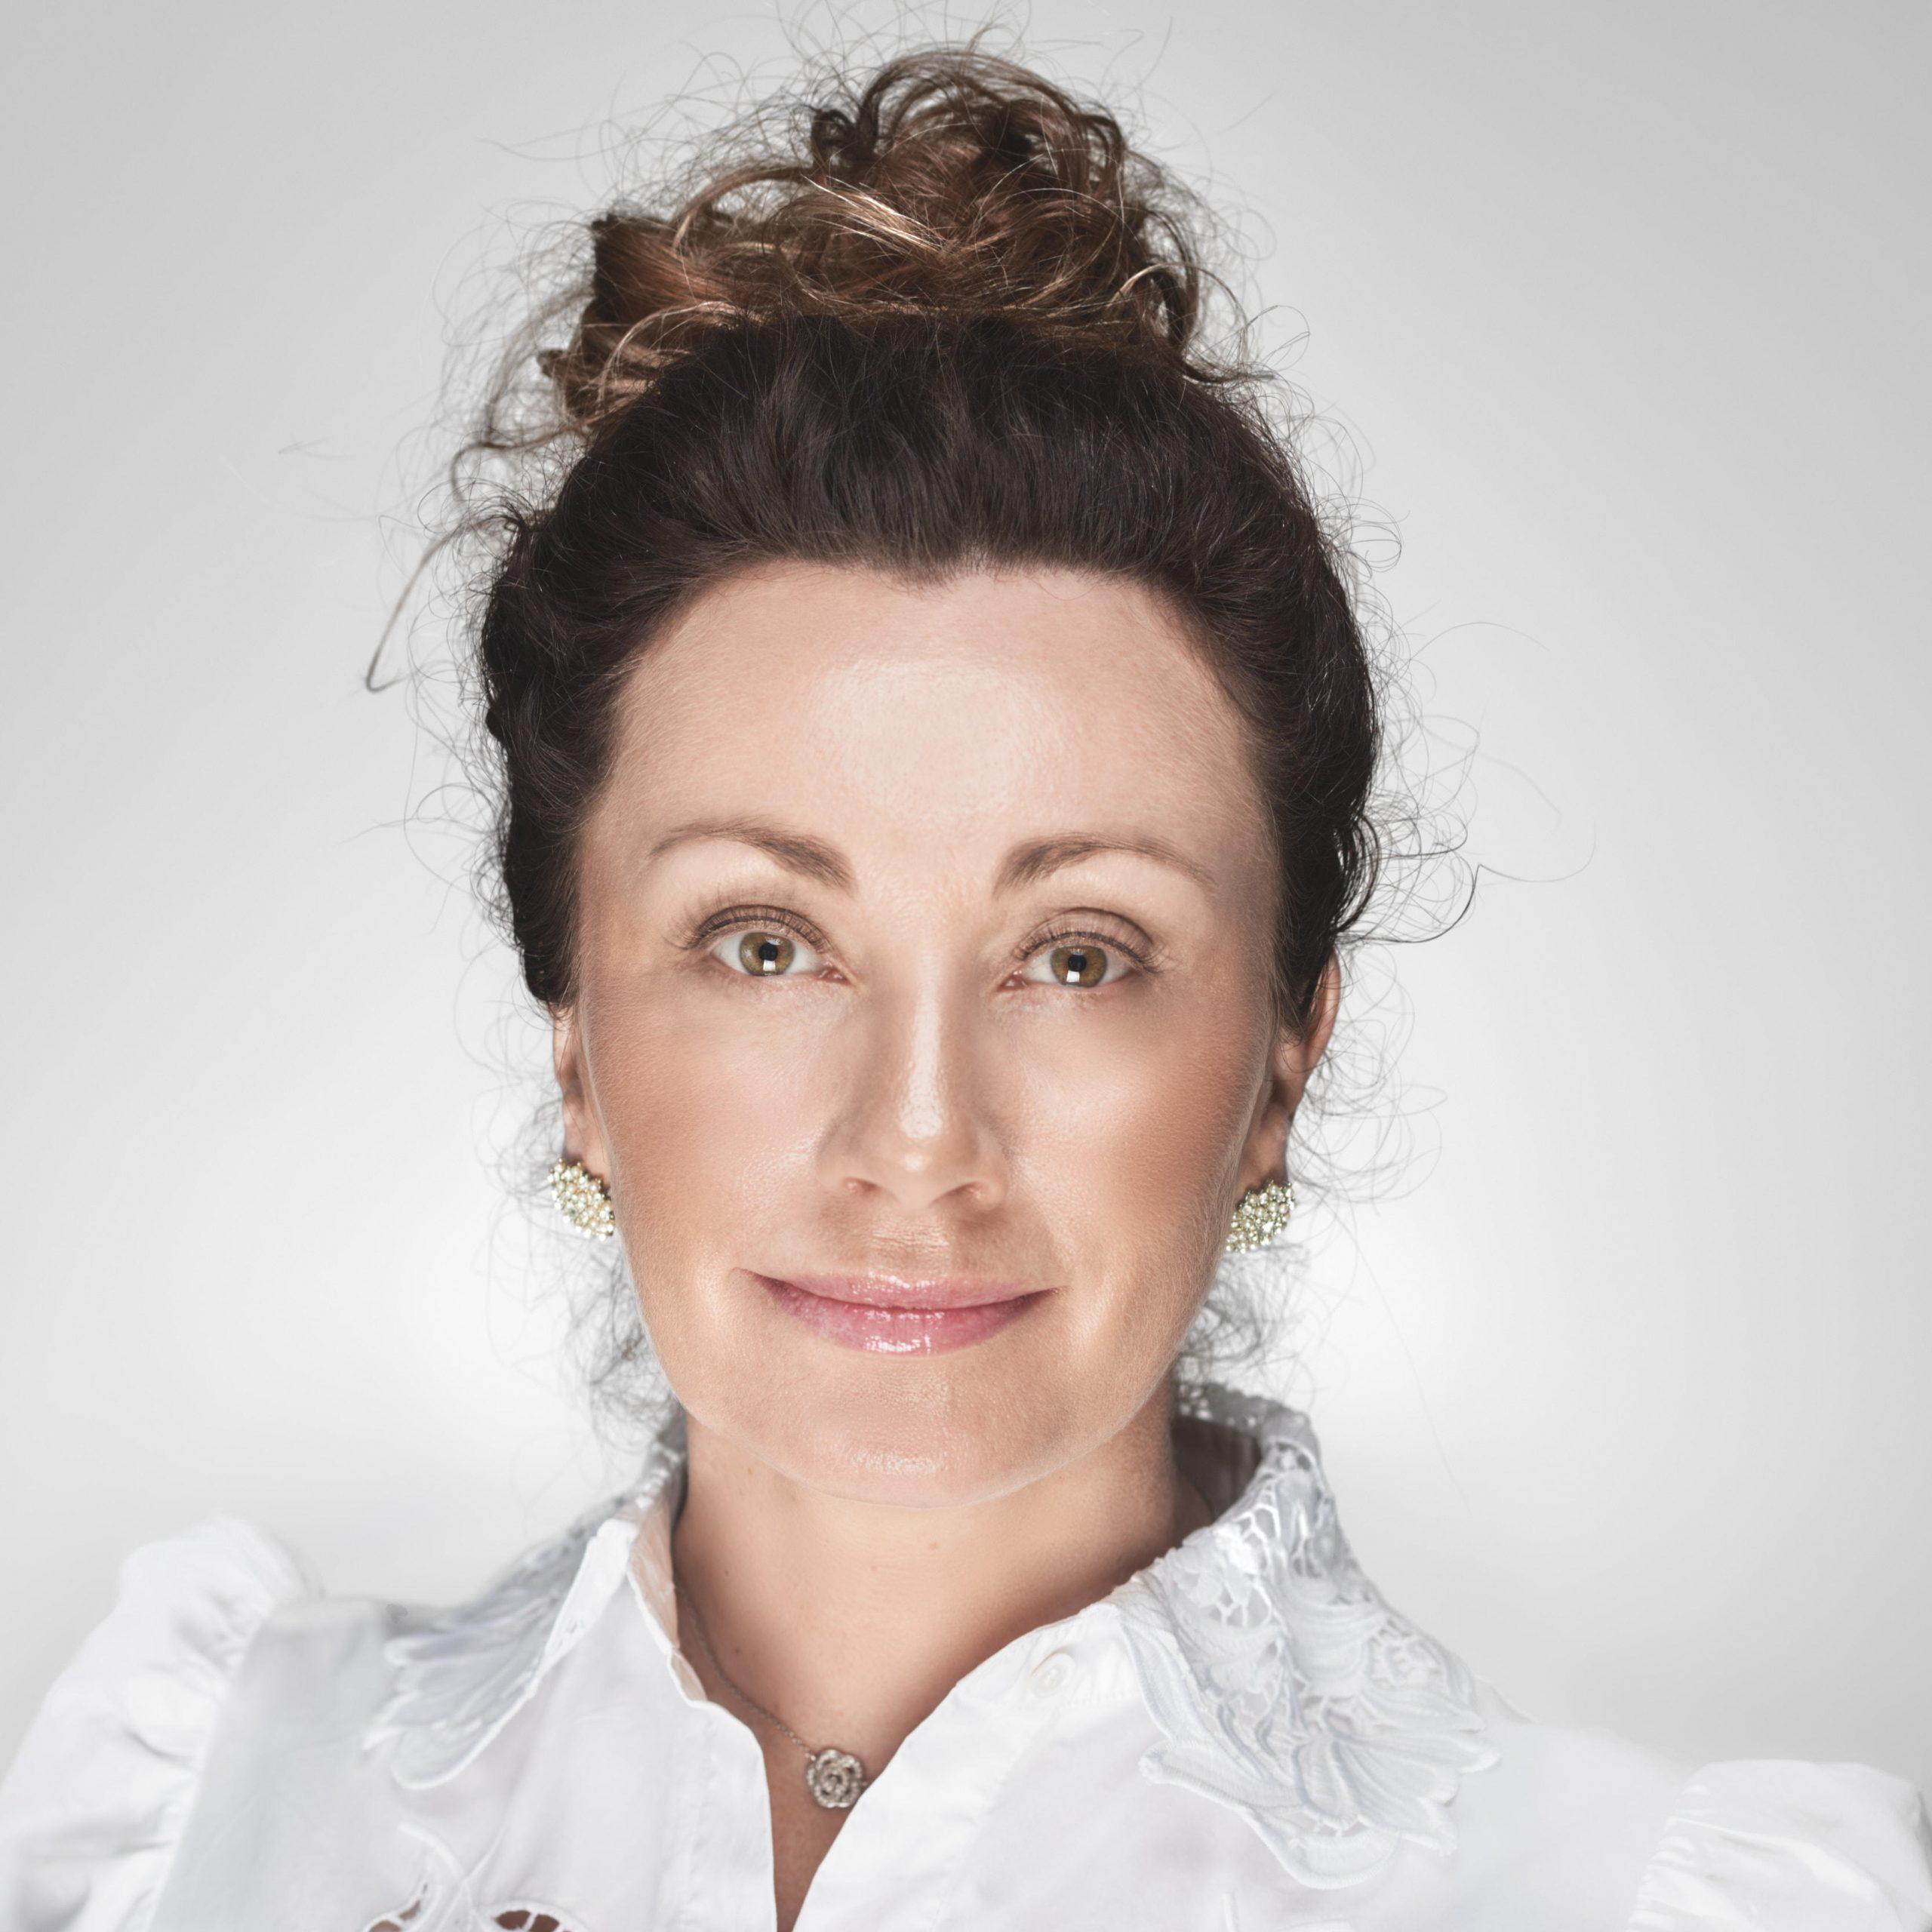 Sam Leon, Medical Aesthetician | Meet the Team | Facial Aesthetics by Julie Scott